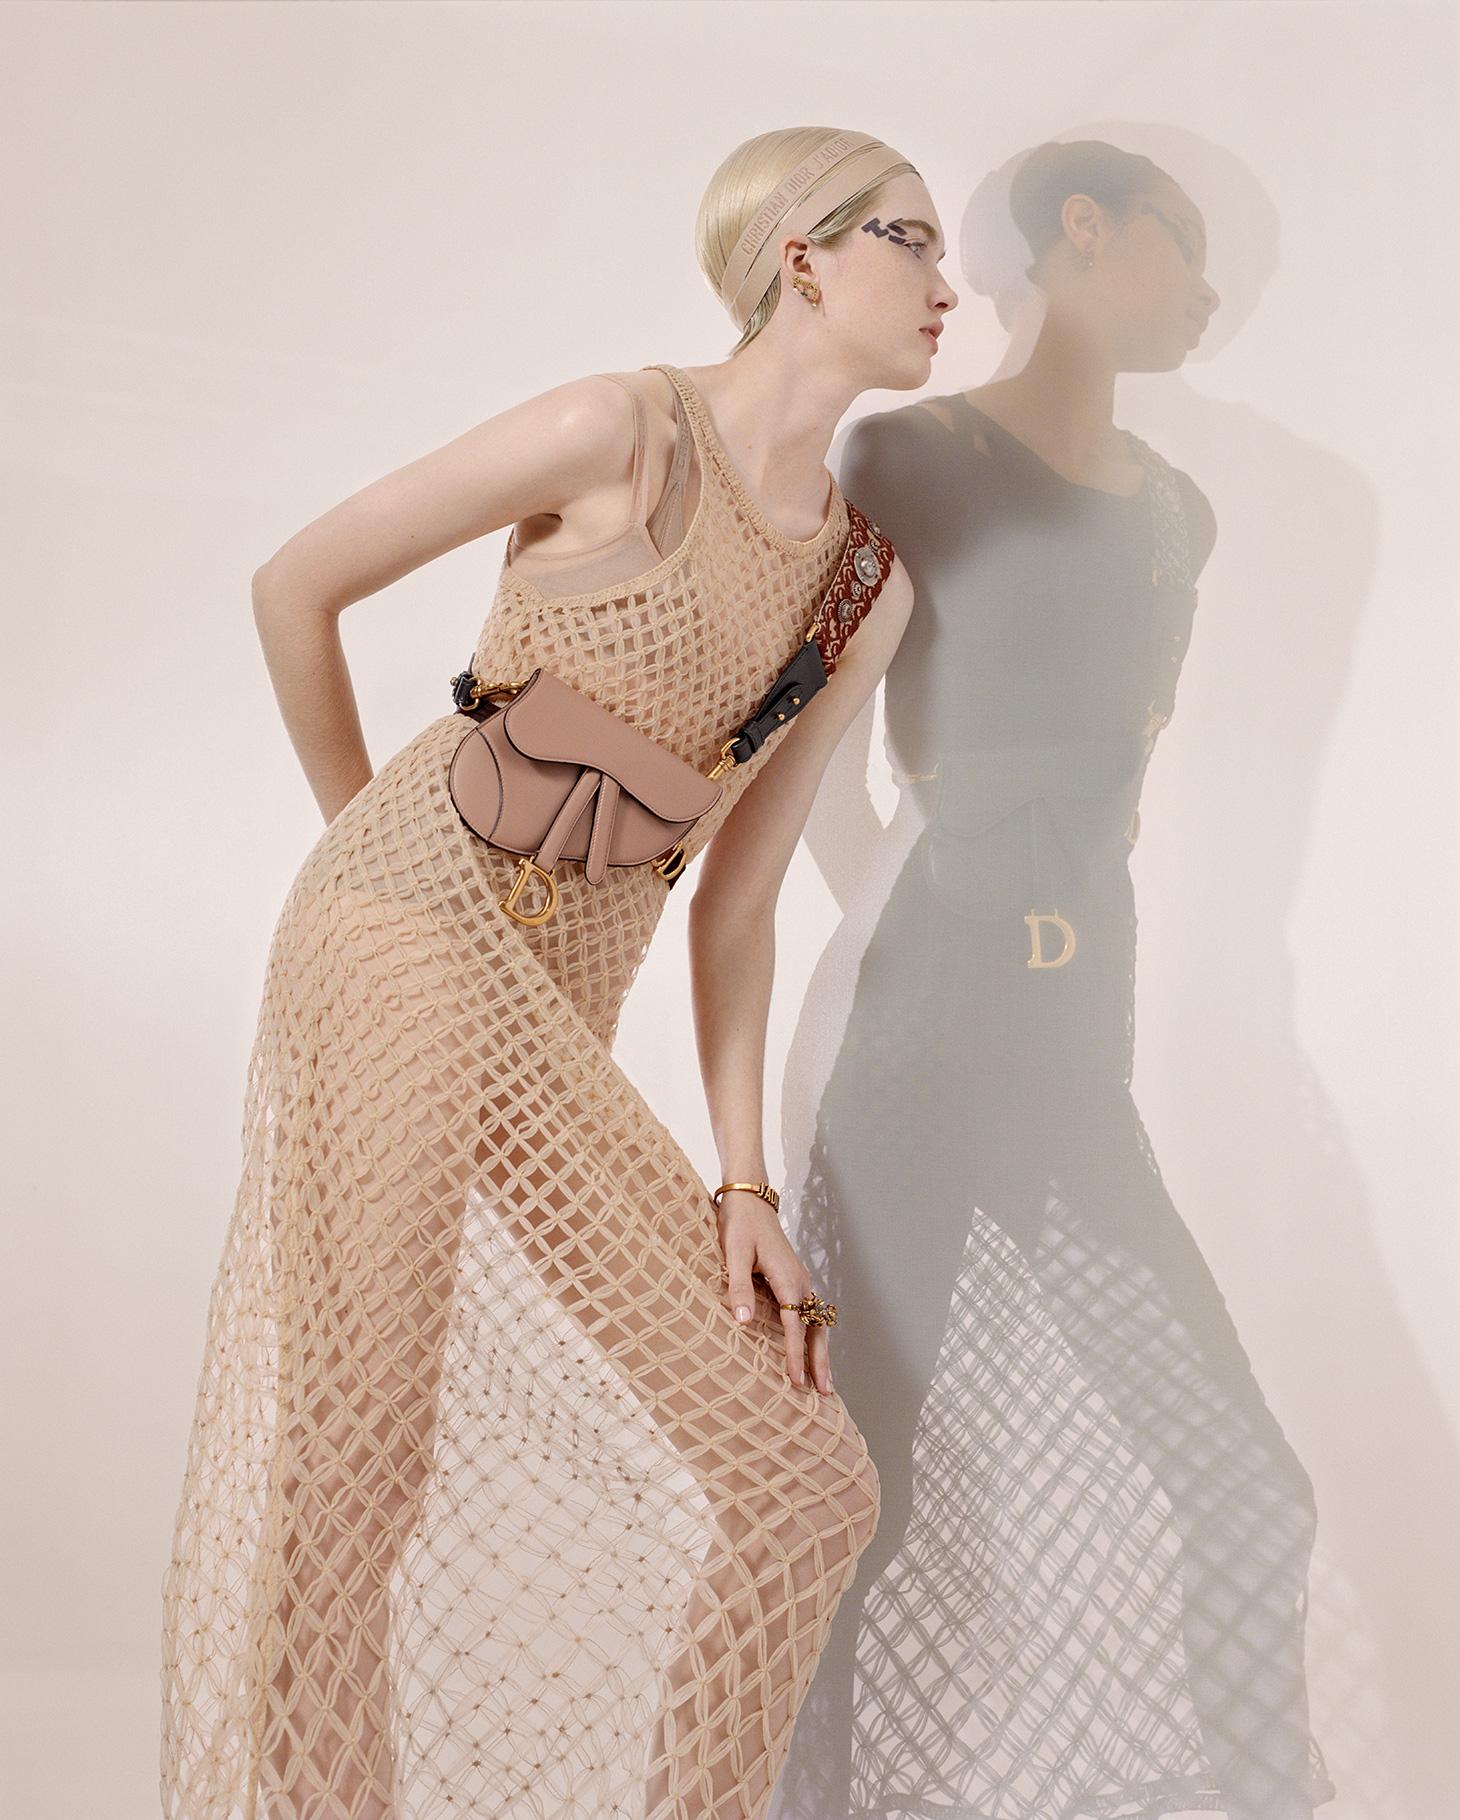 Dior Spring/Summer 2019